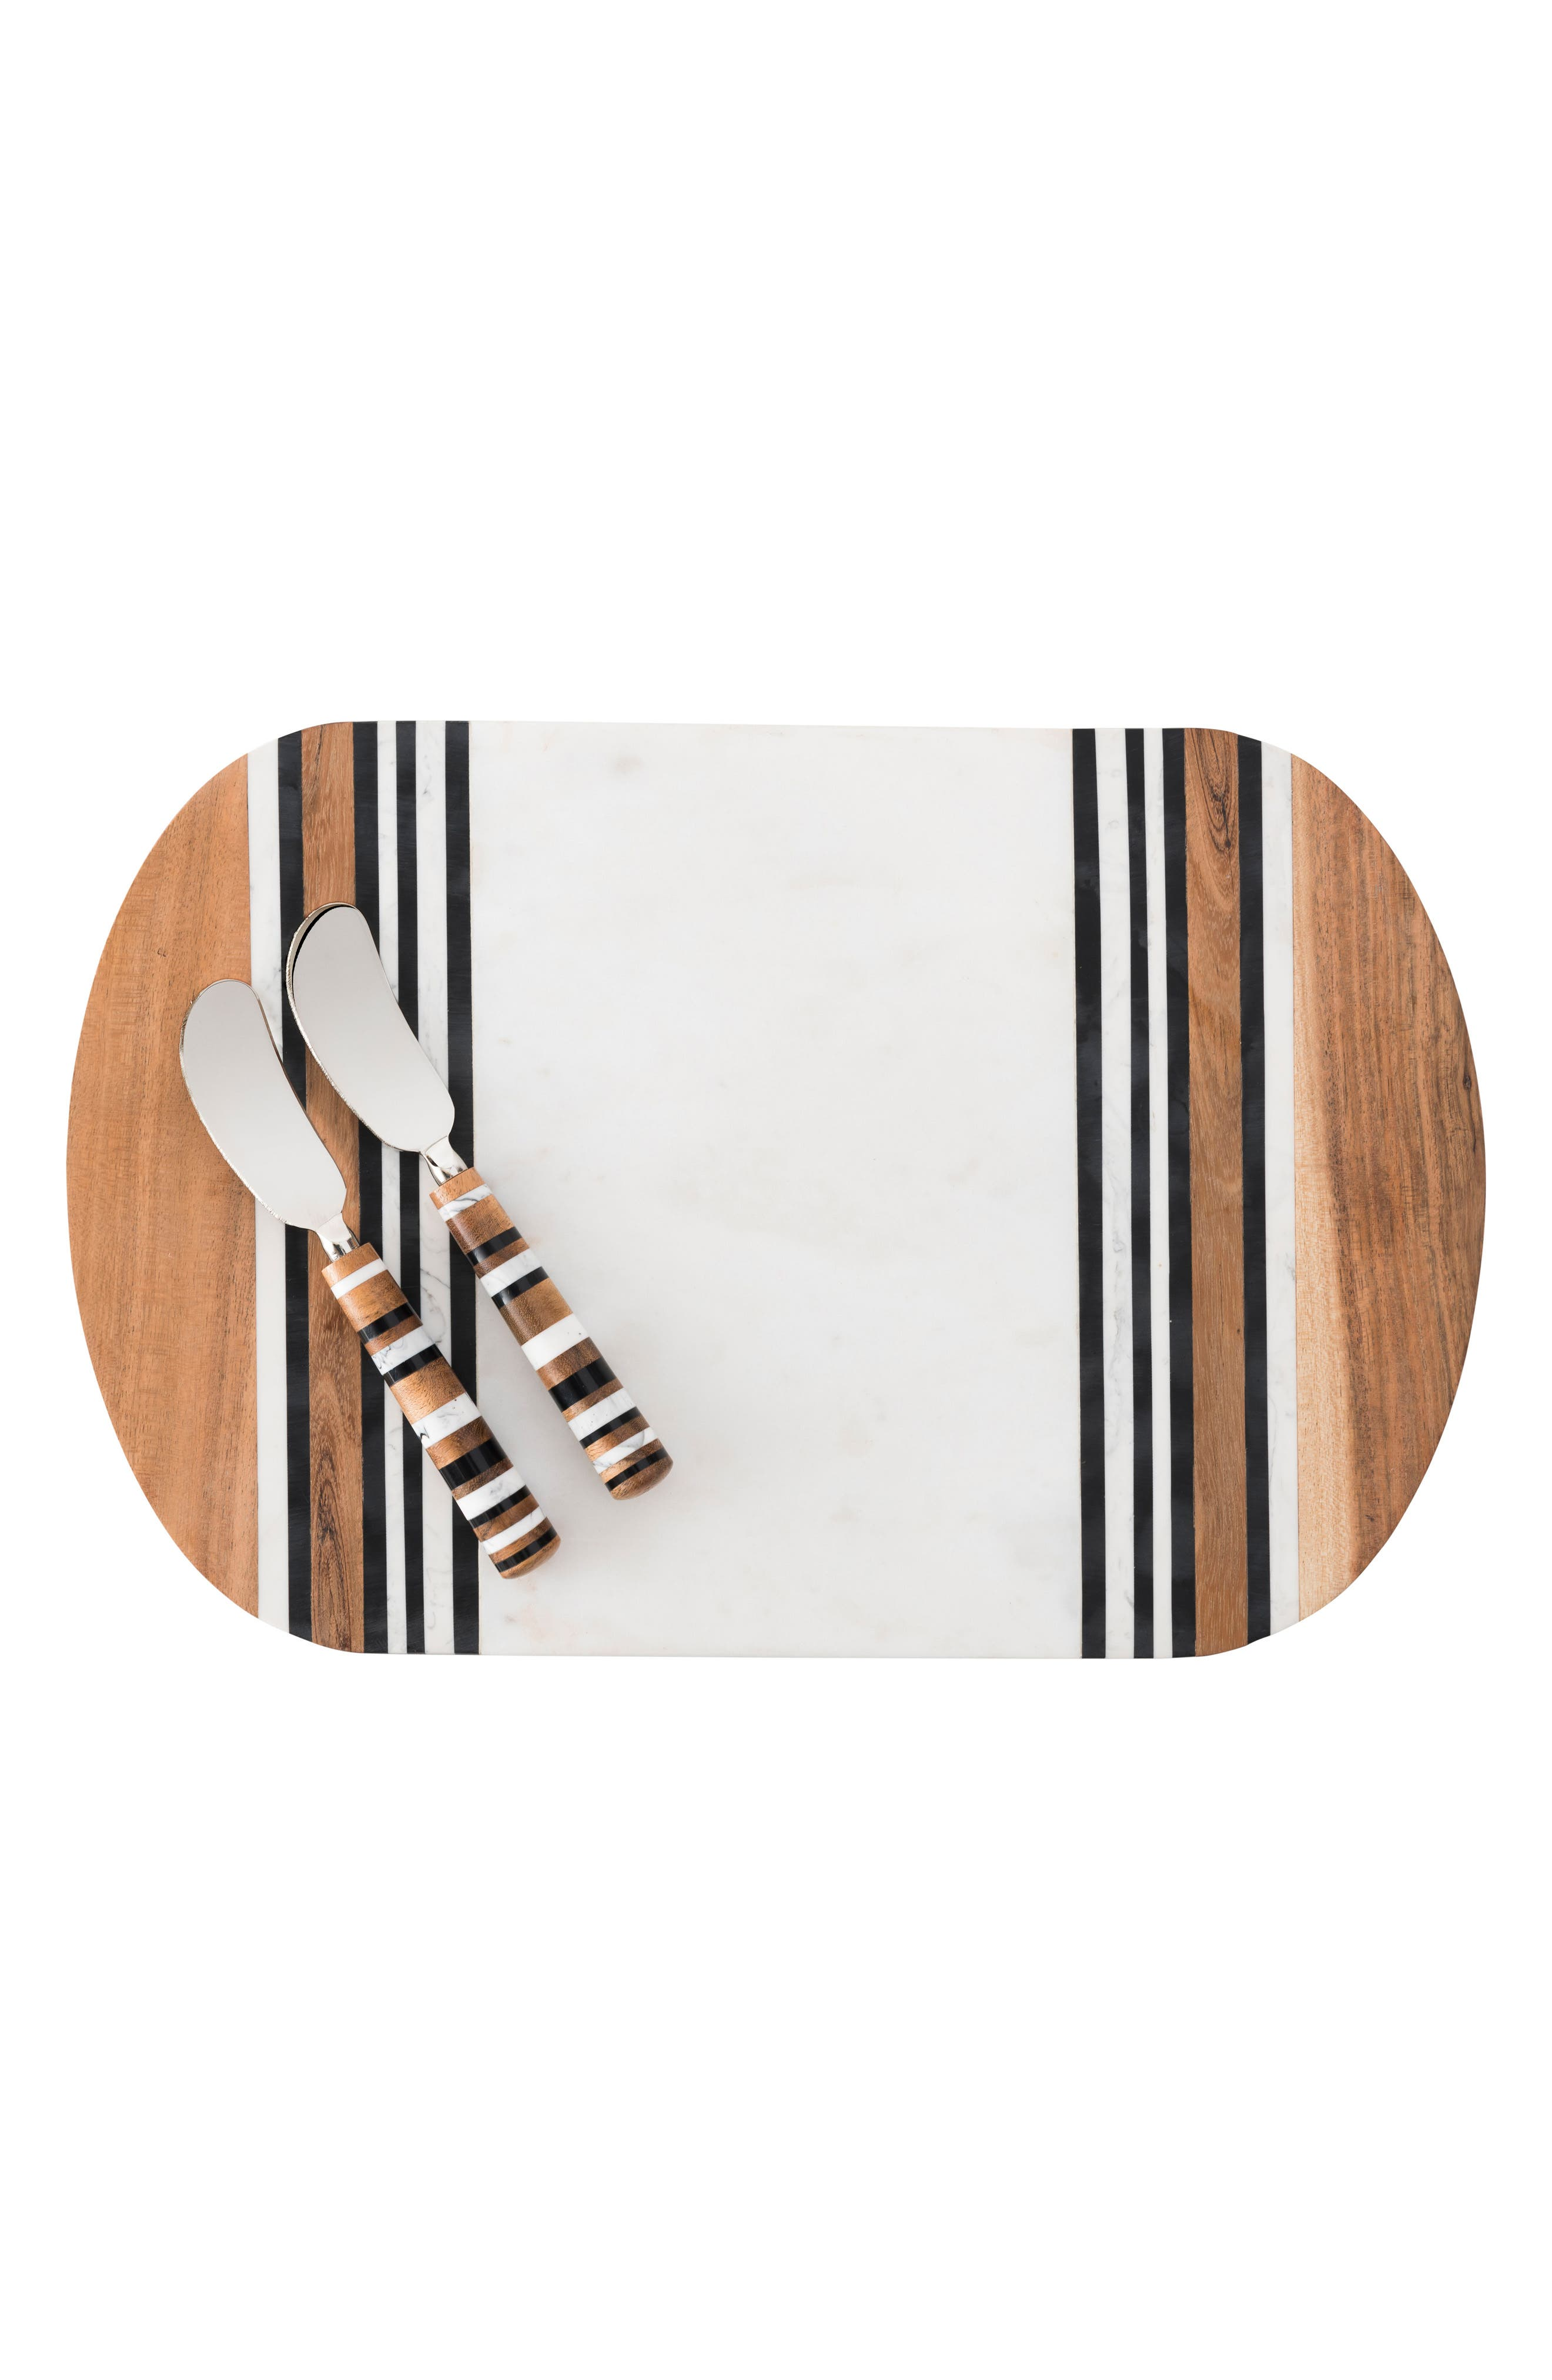 Stonewood Stripe Serving Board & Spreaders,                         Main,                         color, Natural Stripe